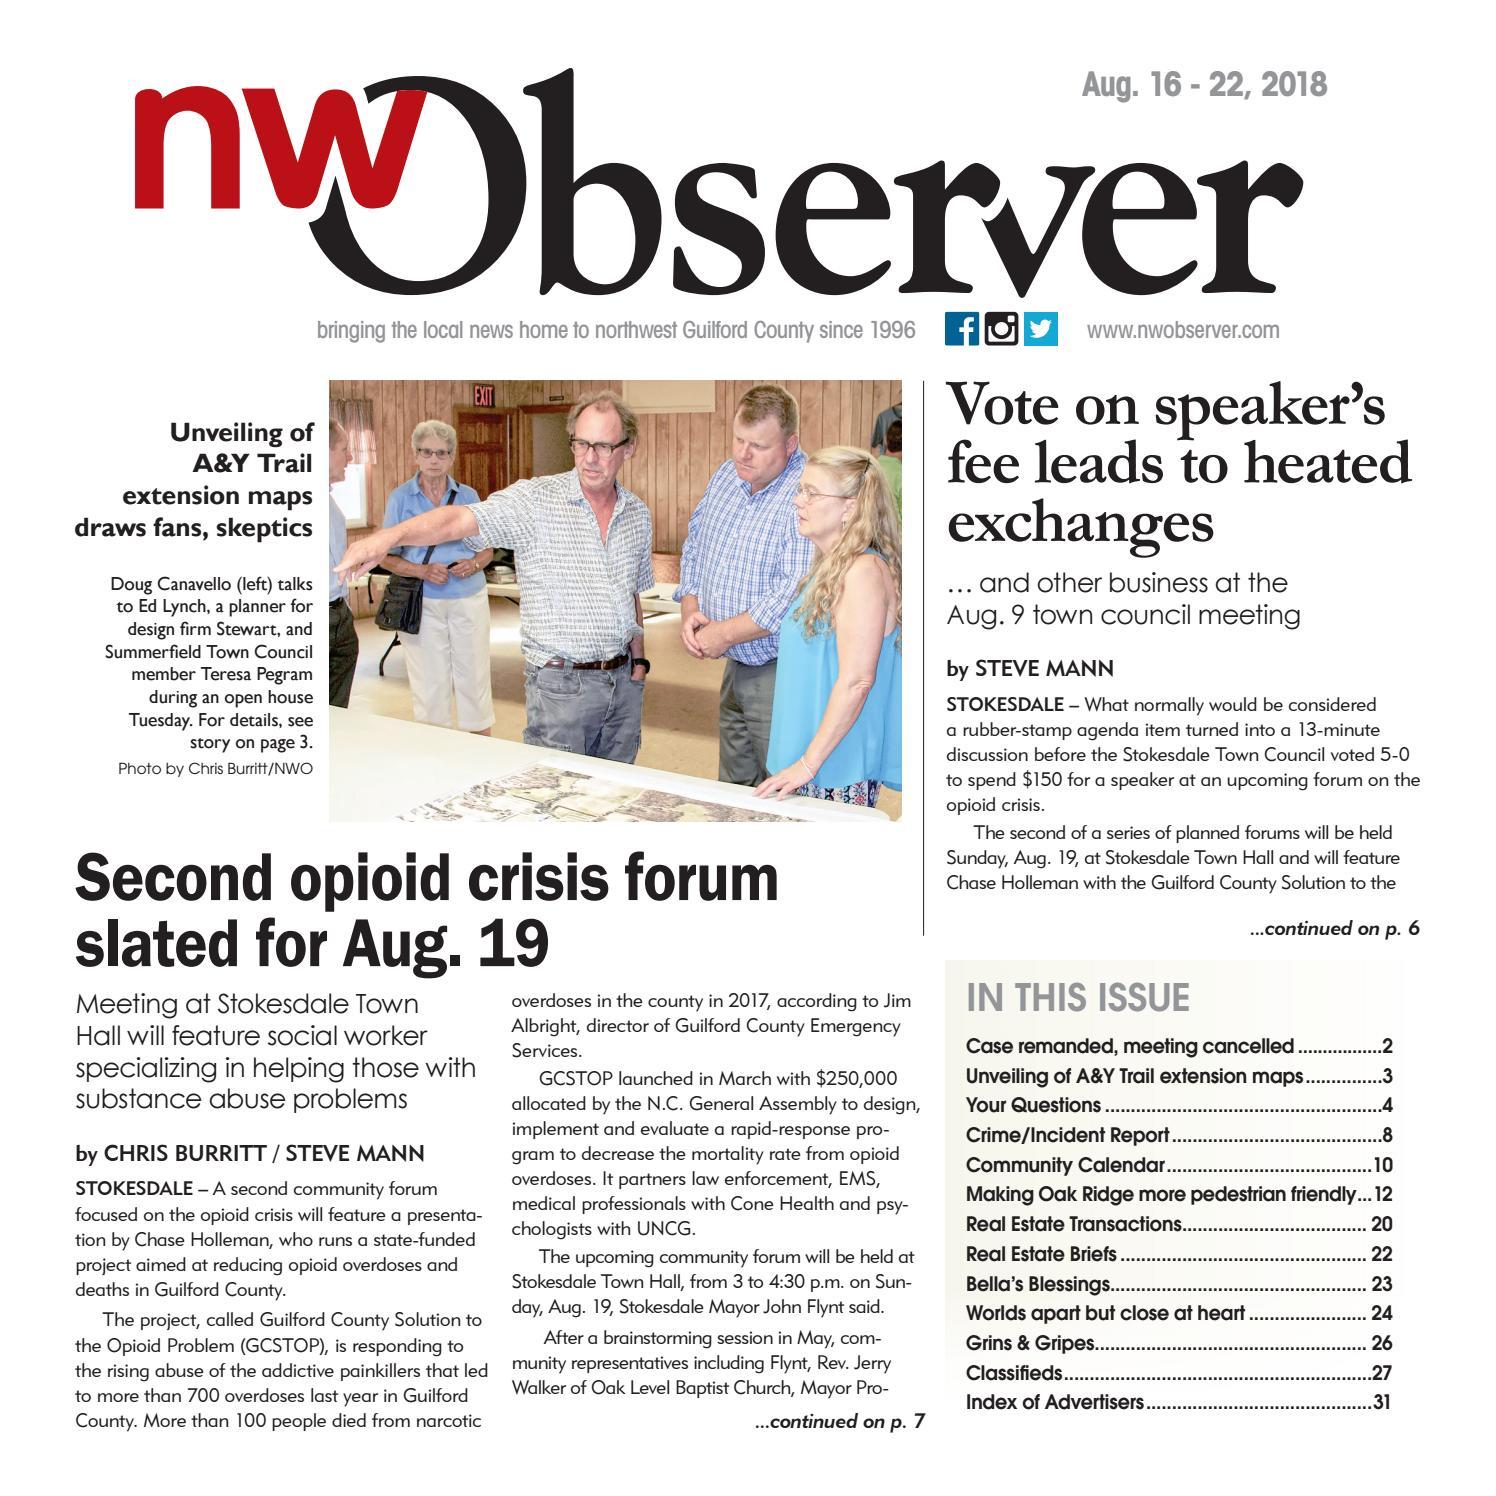 Northwest Observer I Aug  16 - 22, 2018 by pscommunications